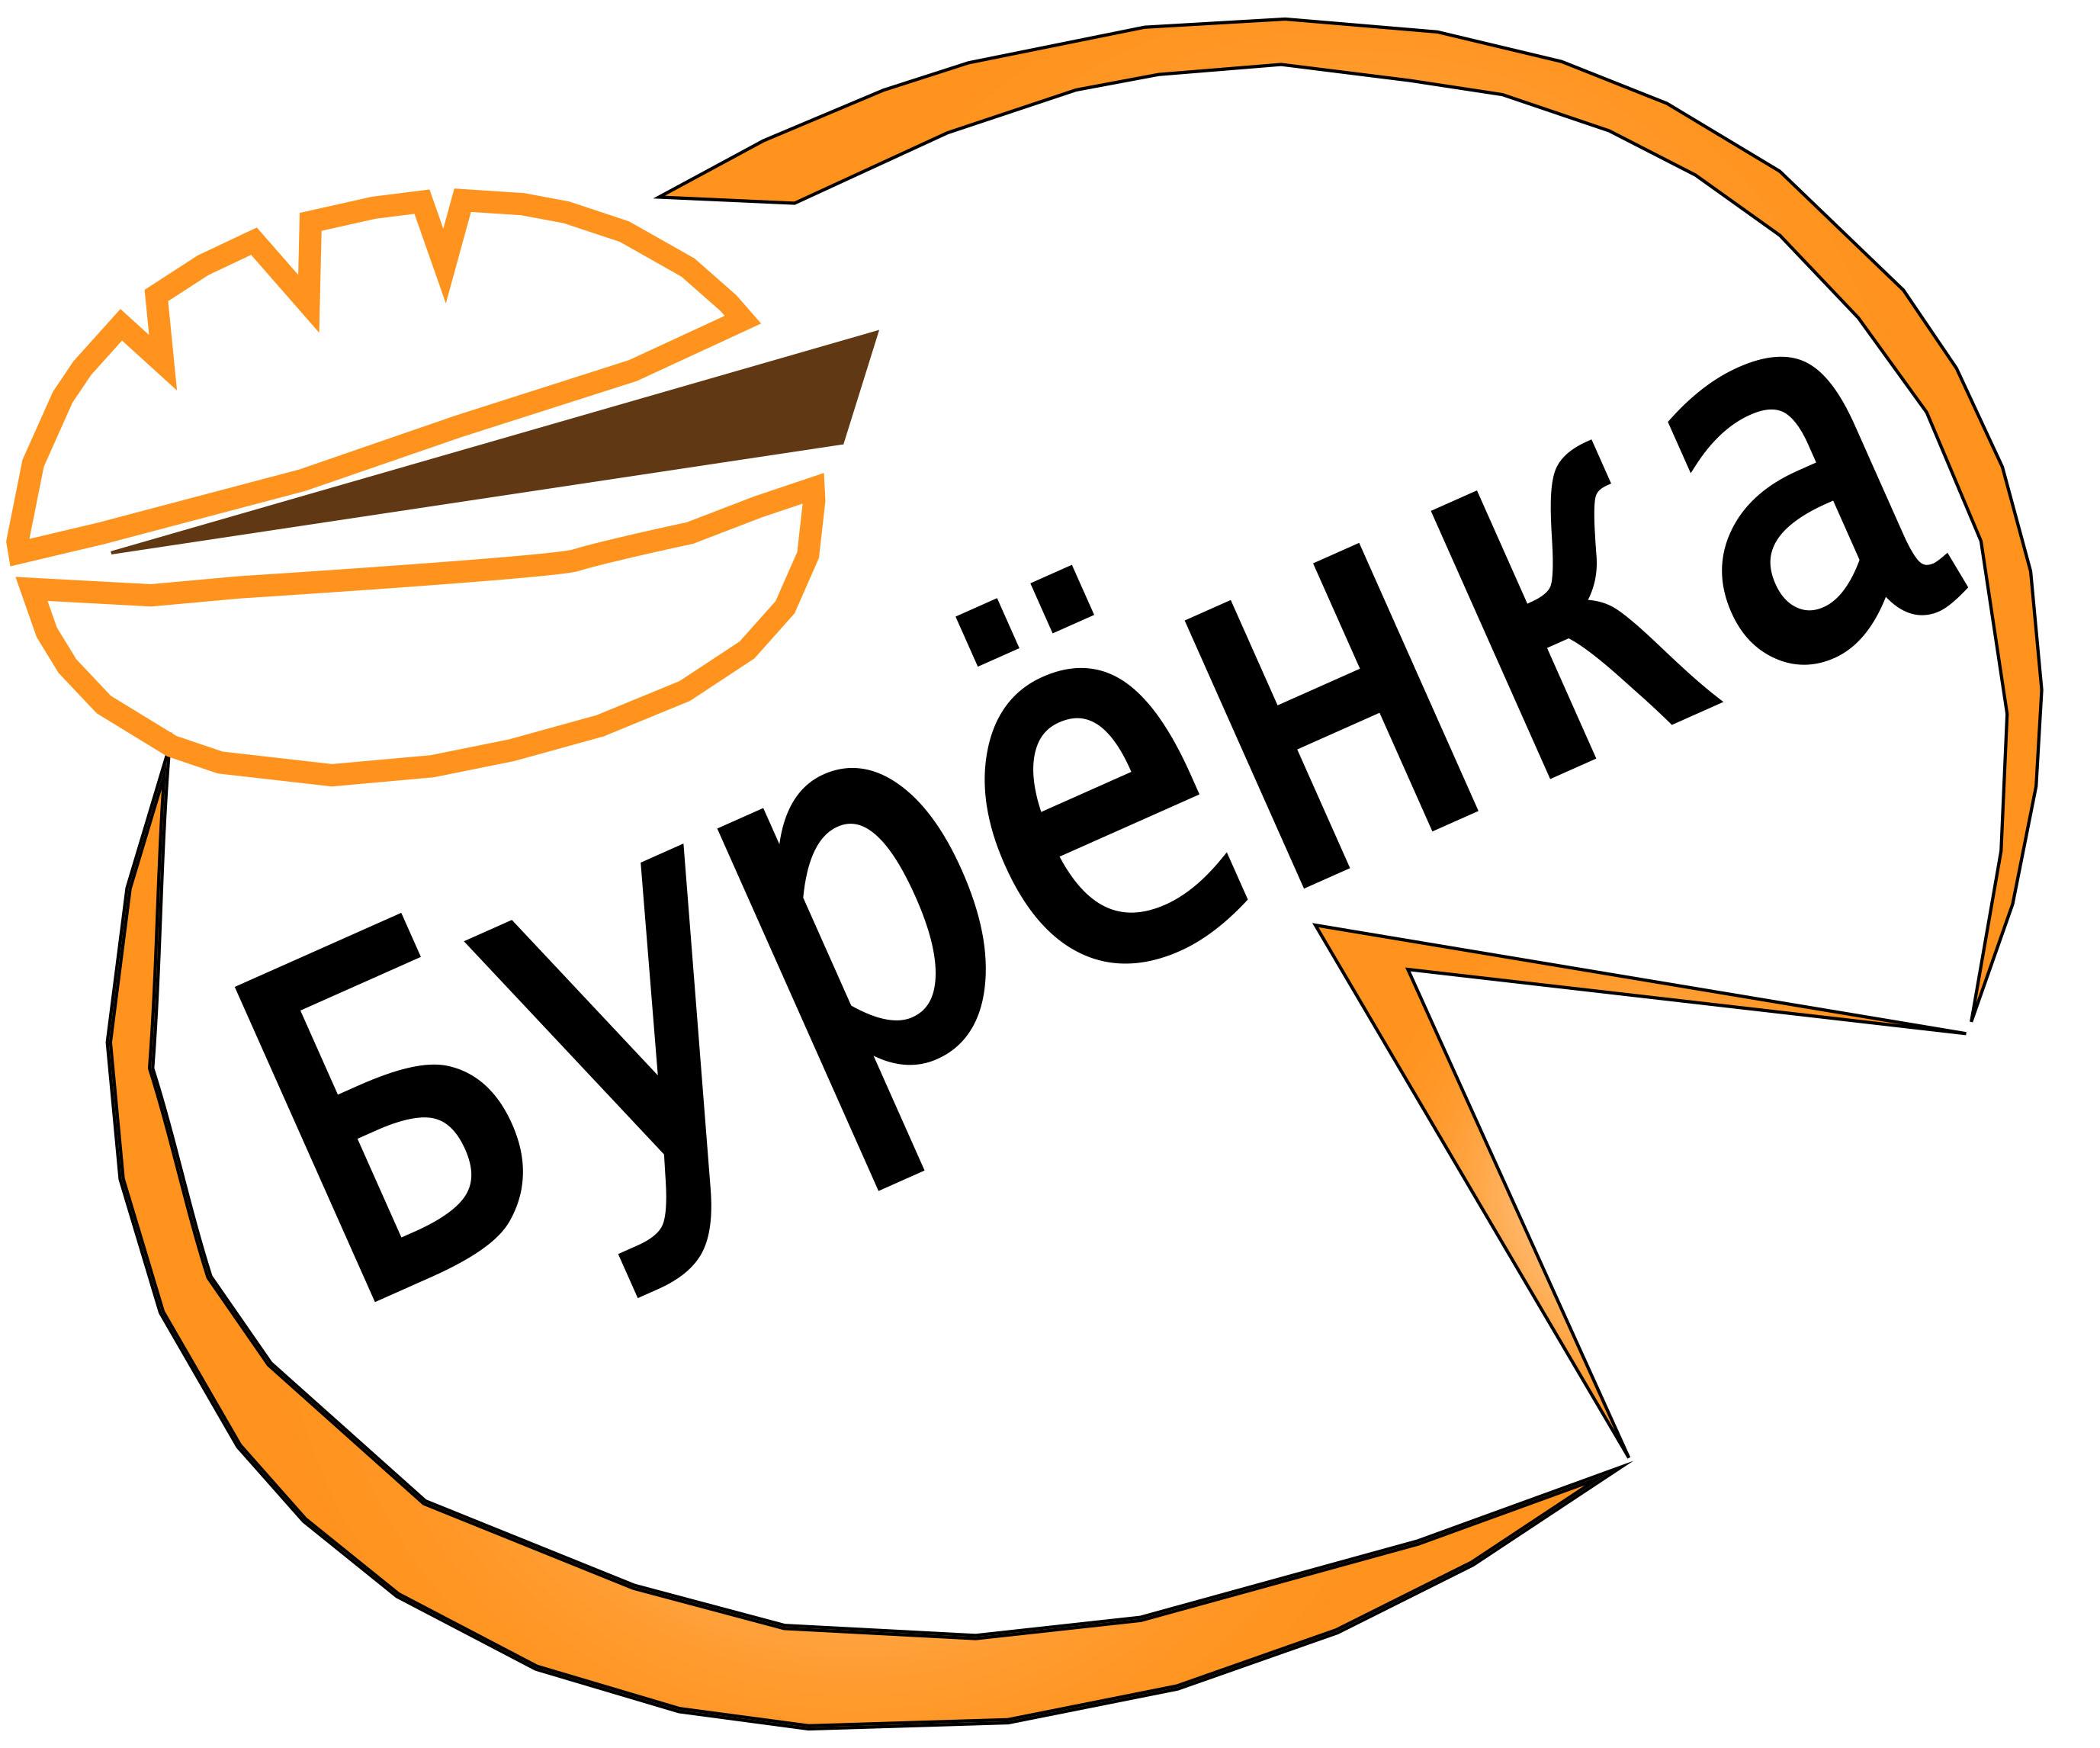 Логотип для Бургерной с Пекарней фото f_6945e106f9c22fa4.jpg